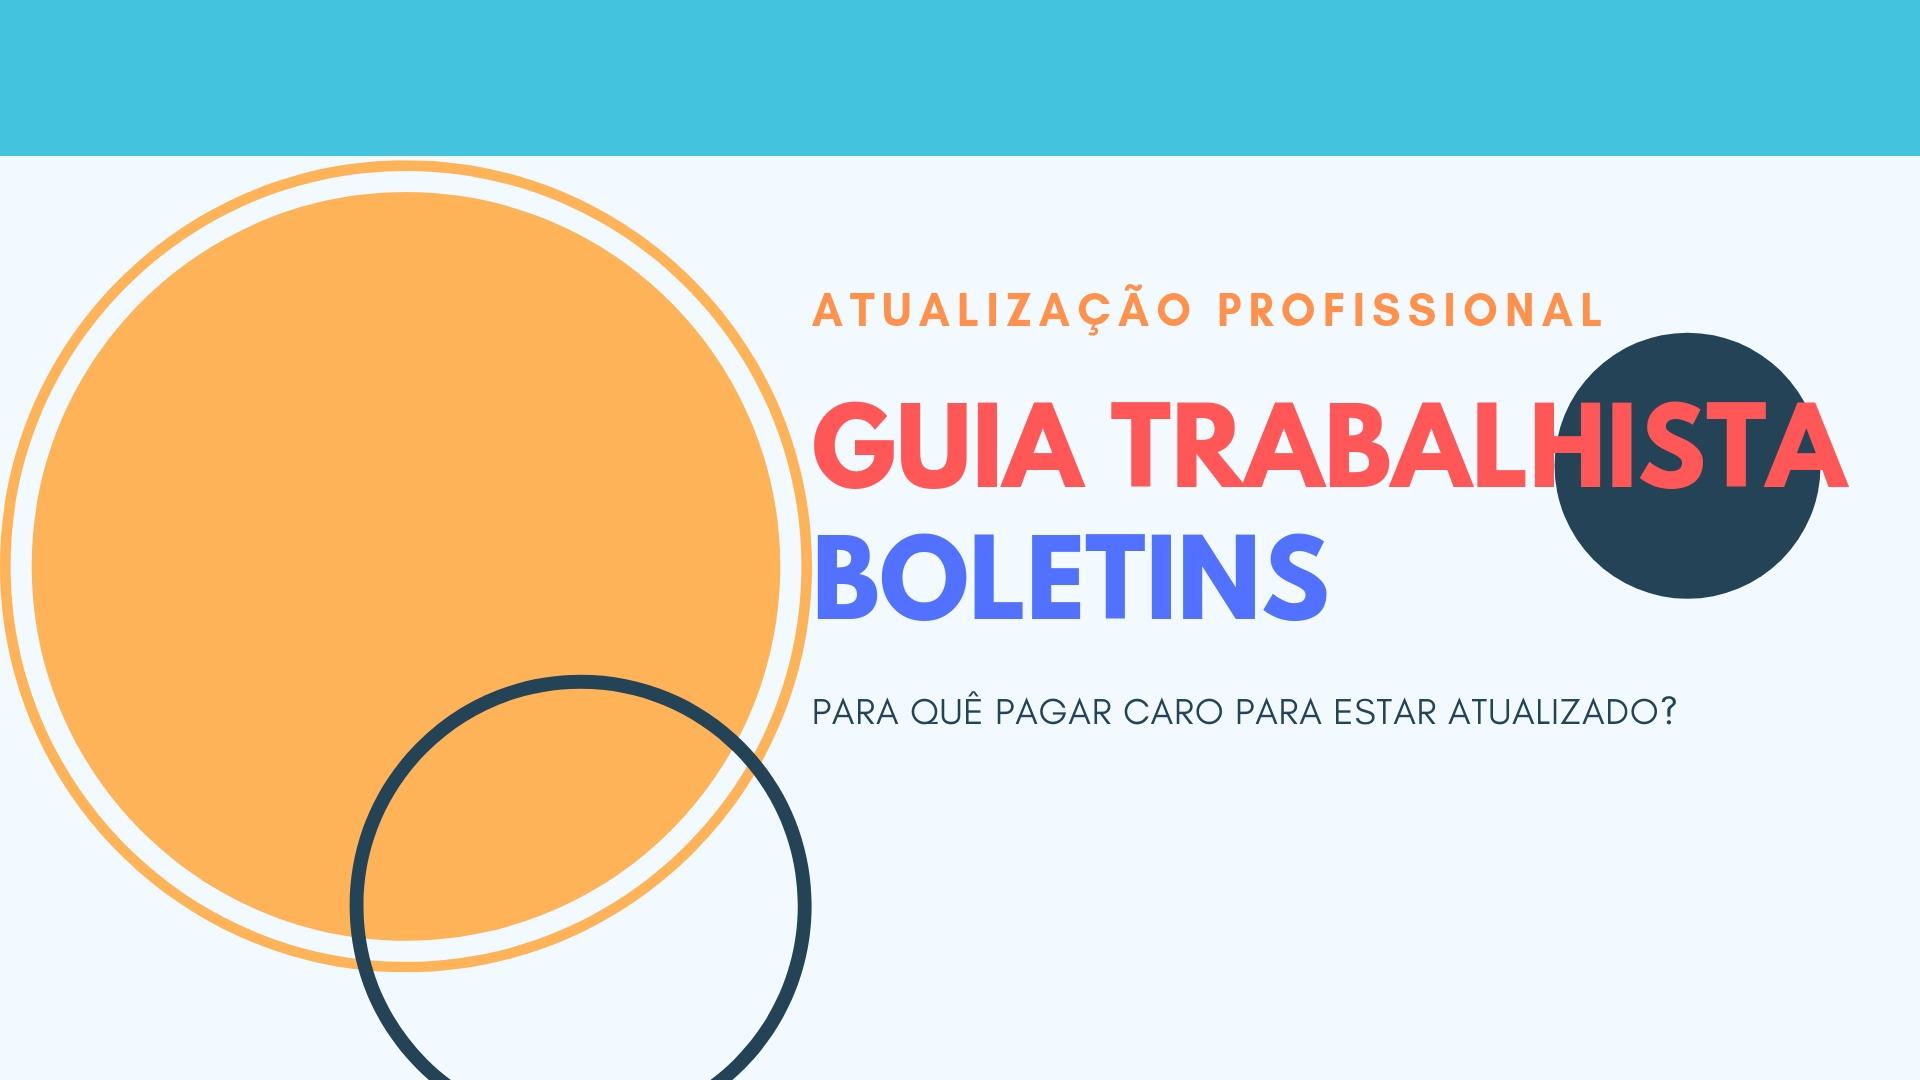 GuiaTrabalhista